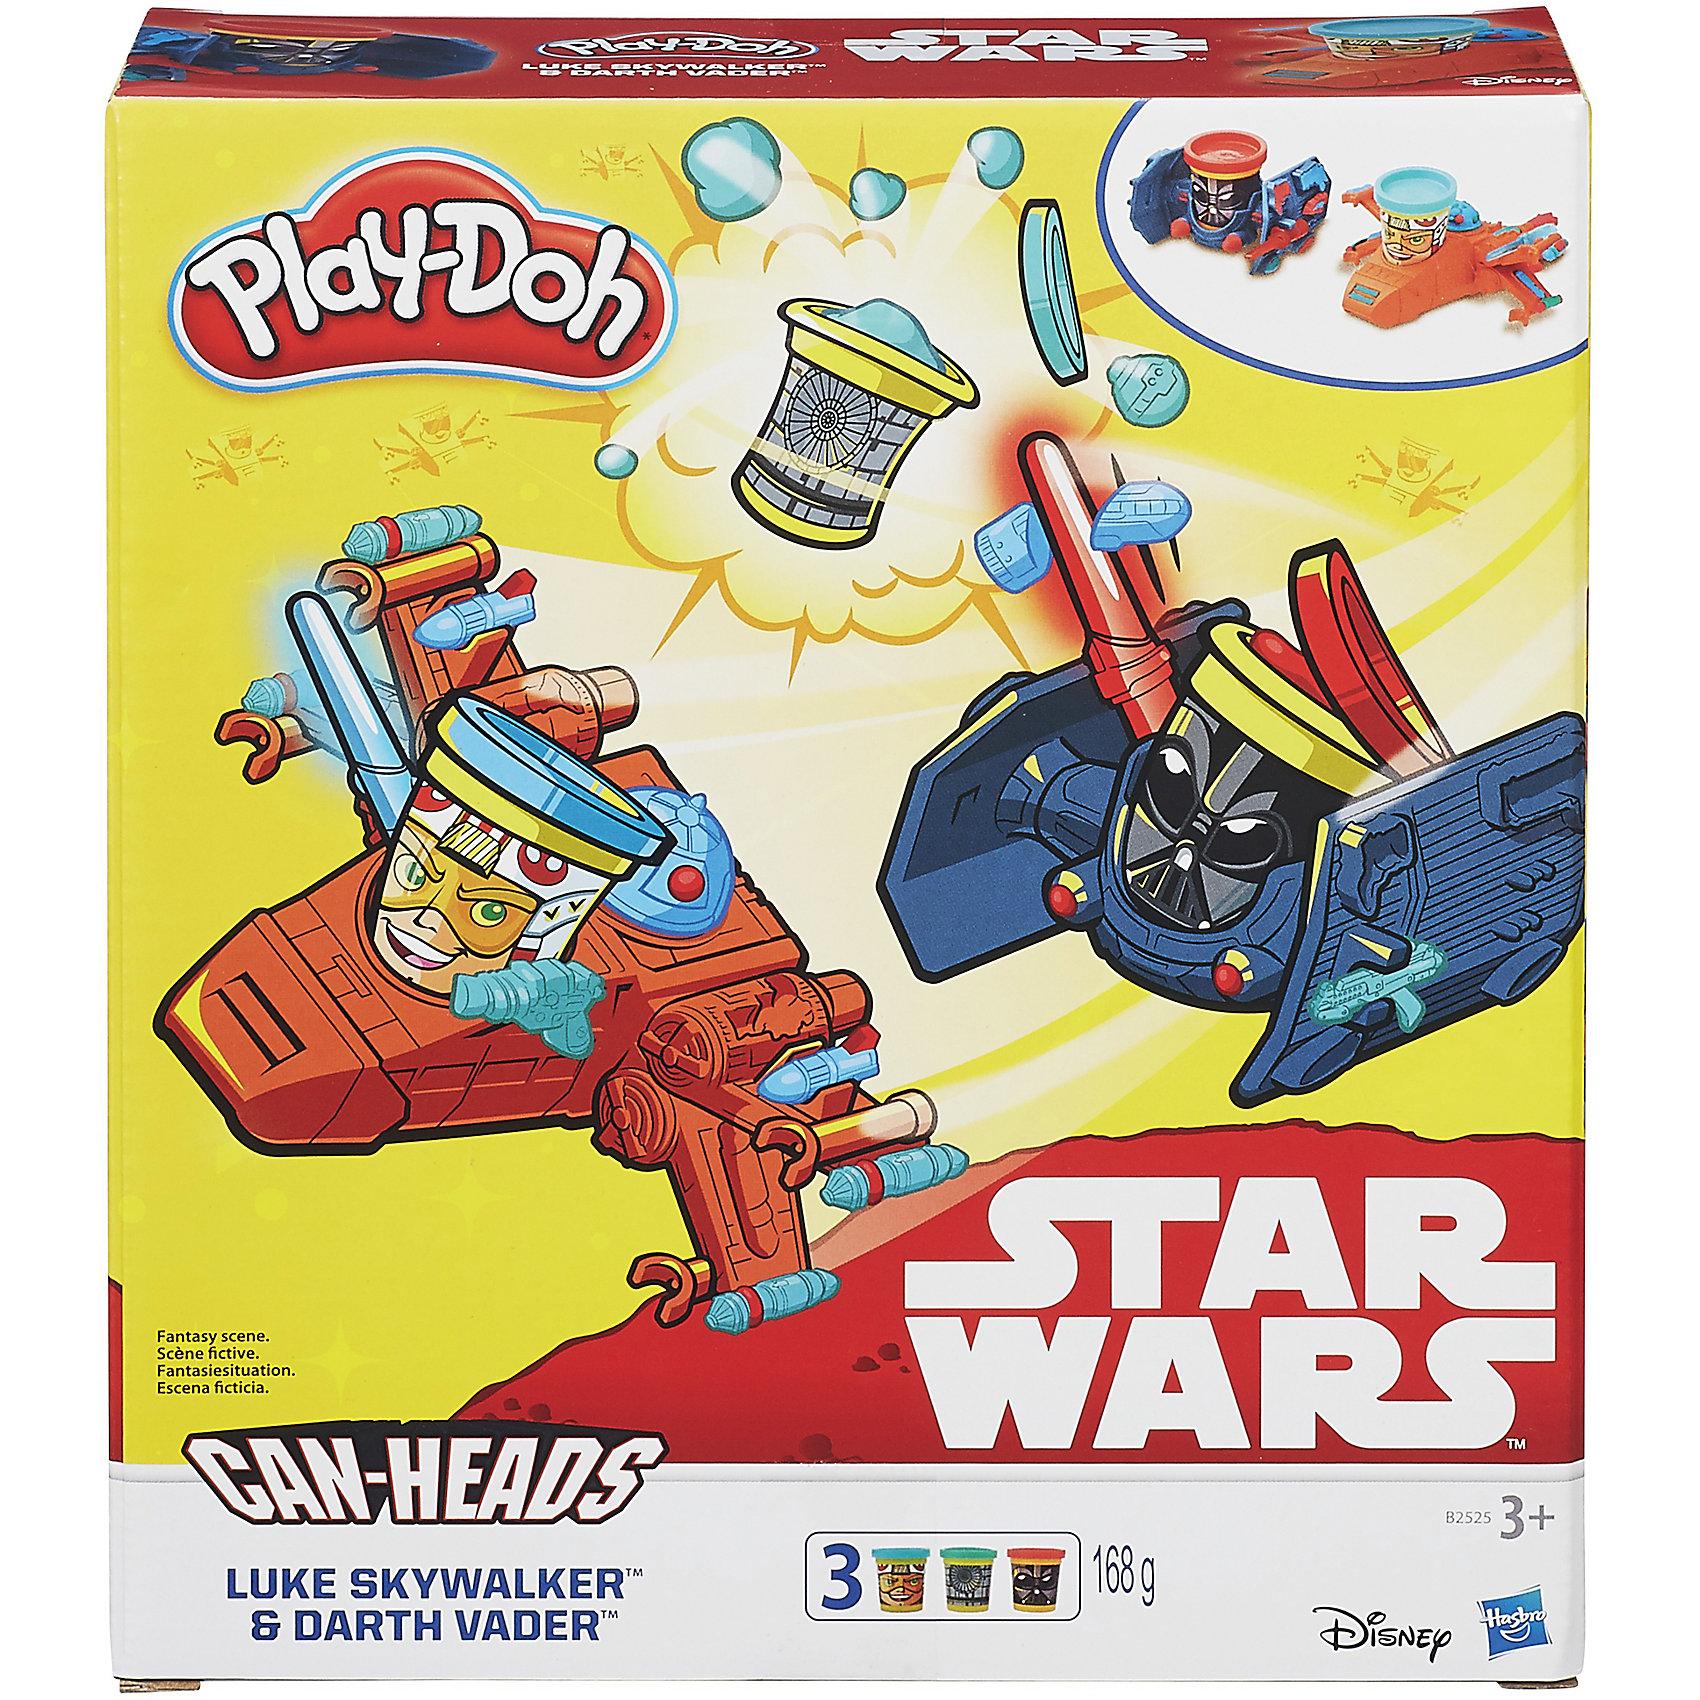 Транспортные средства героев Звездных войн, Play-Doh, var 2 от myToys